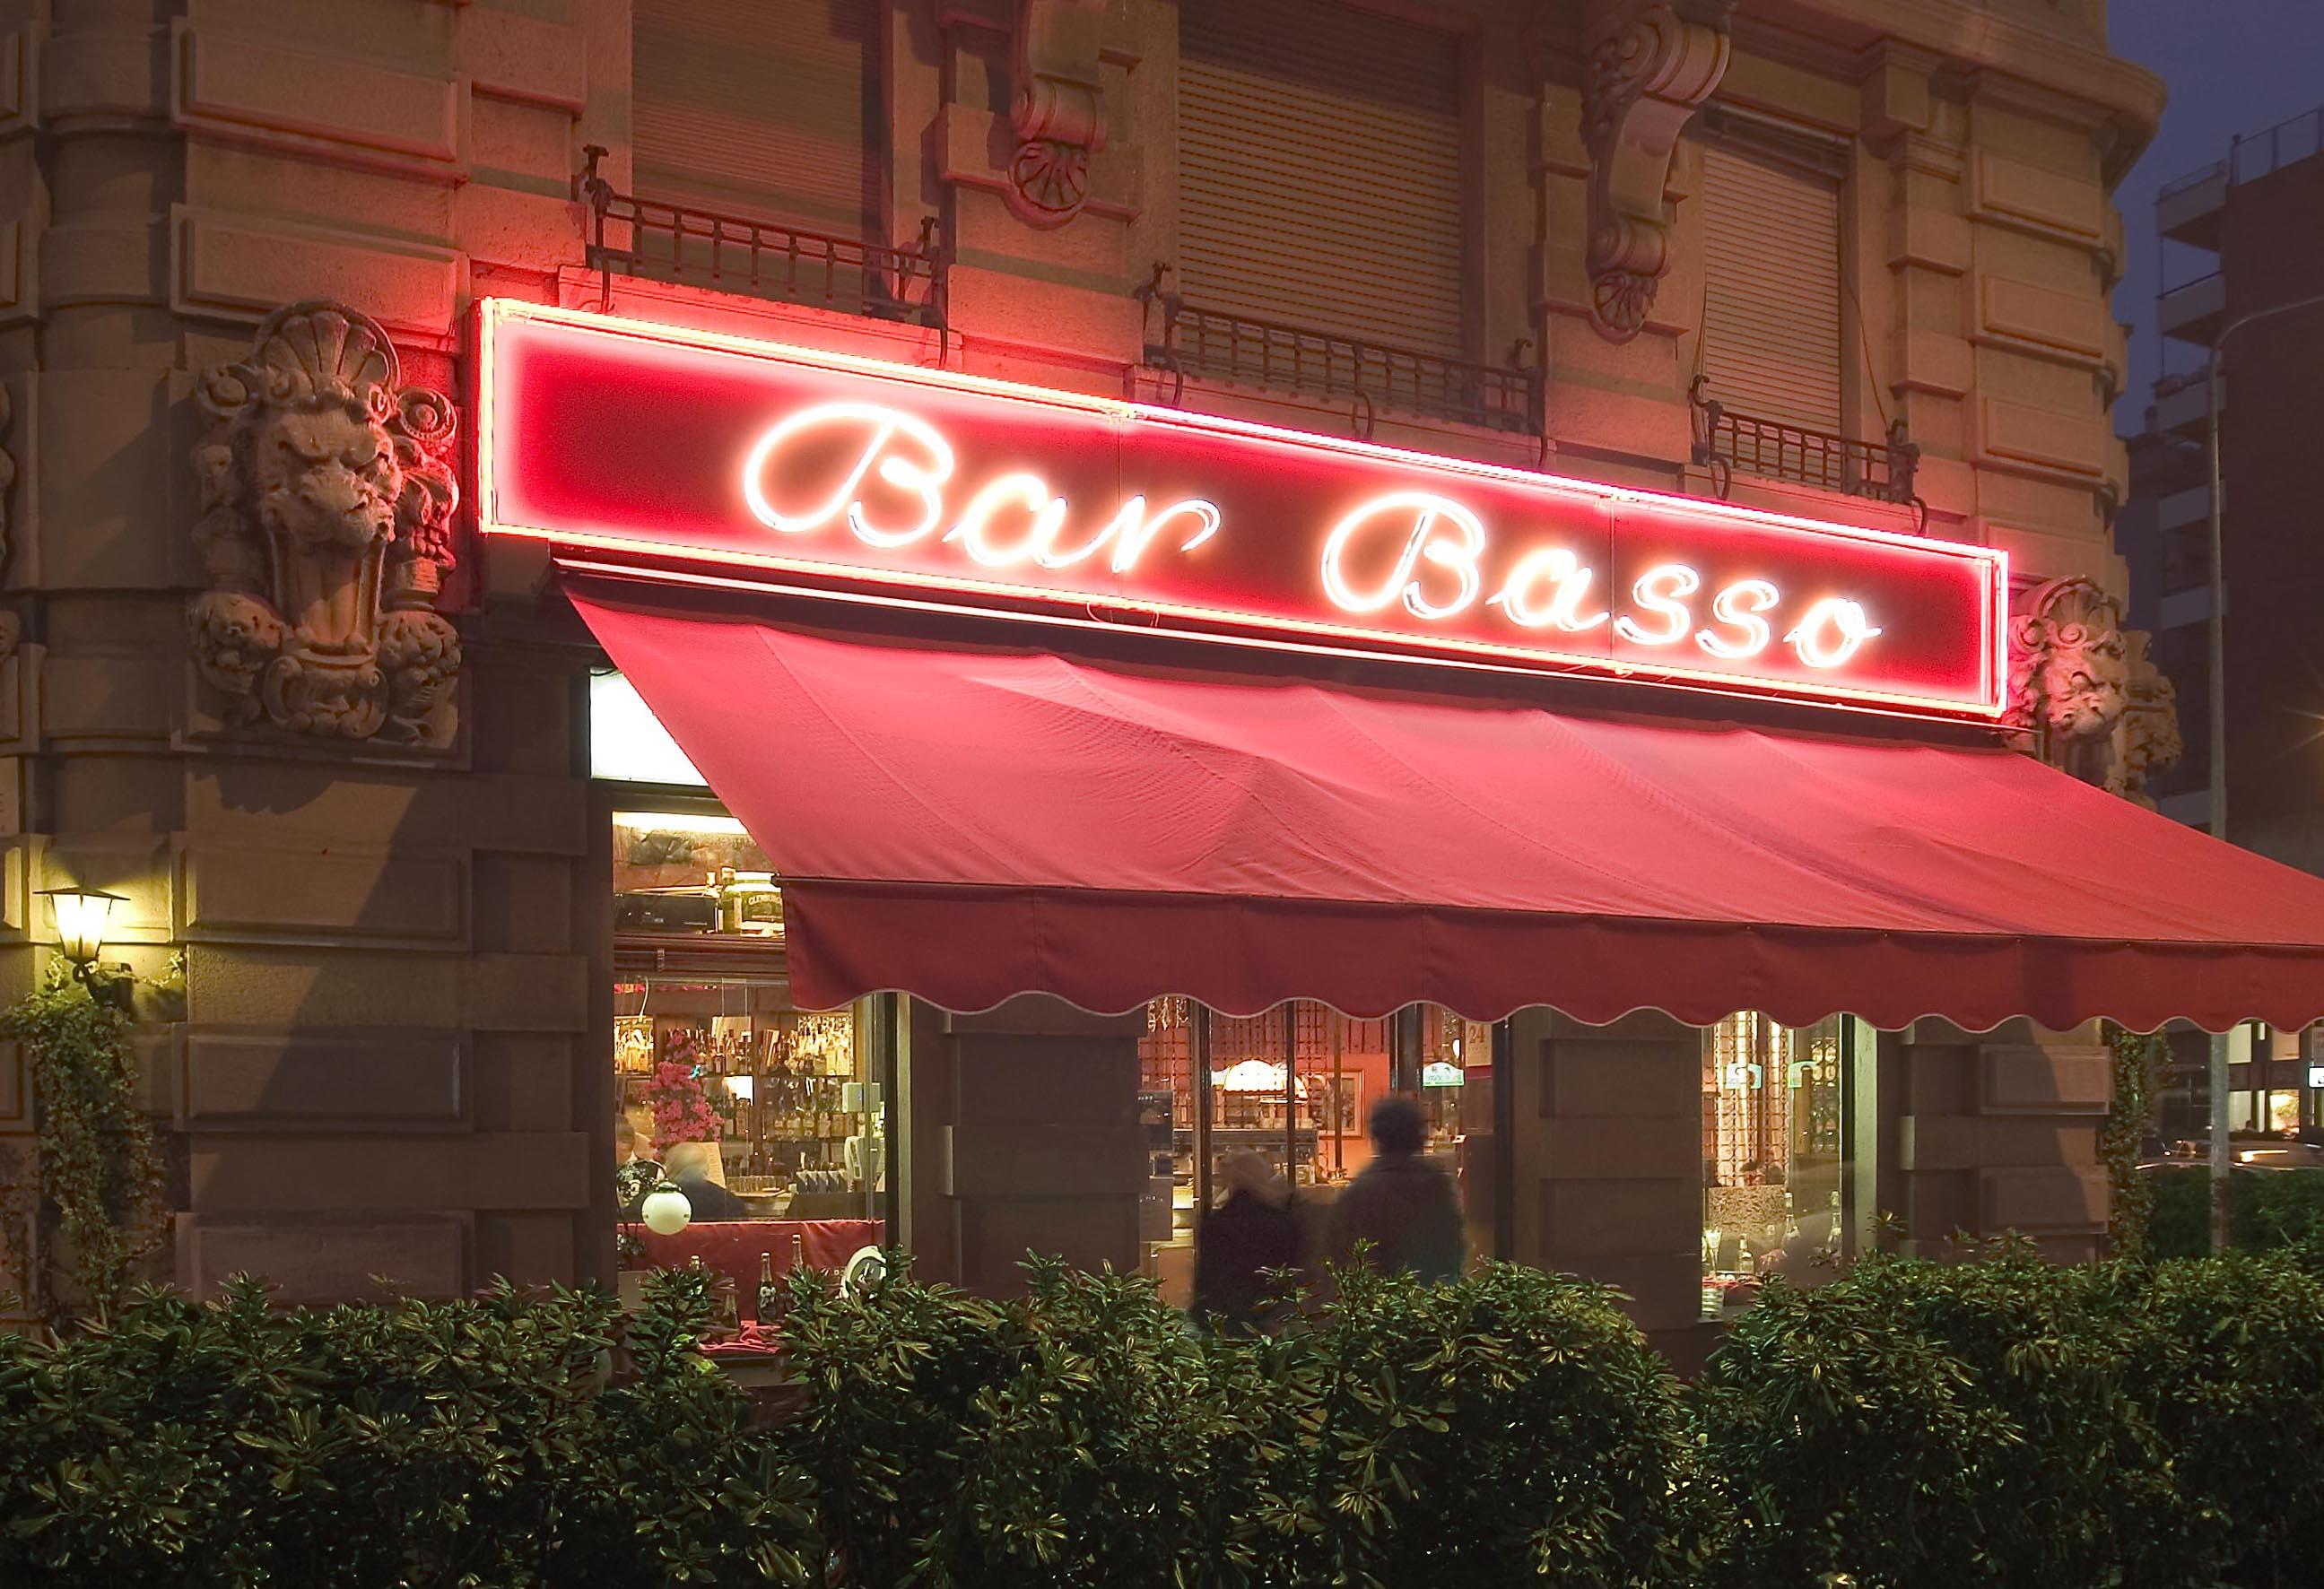 Bar Basso - best cocktail bar in Milan